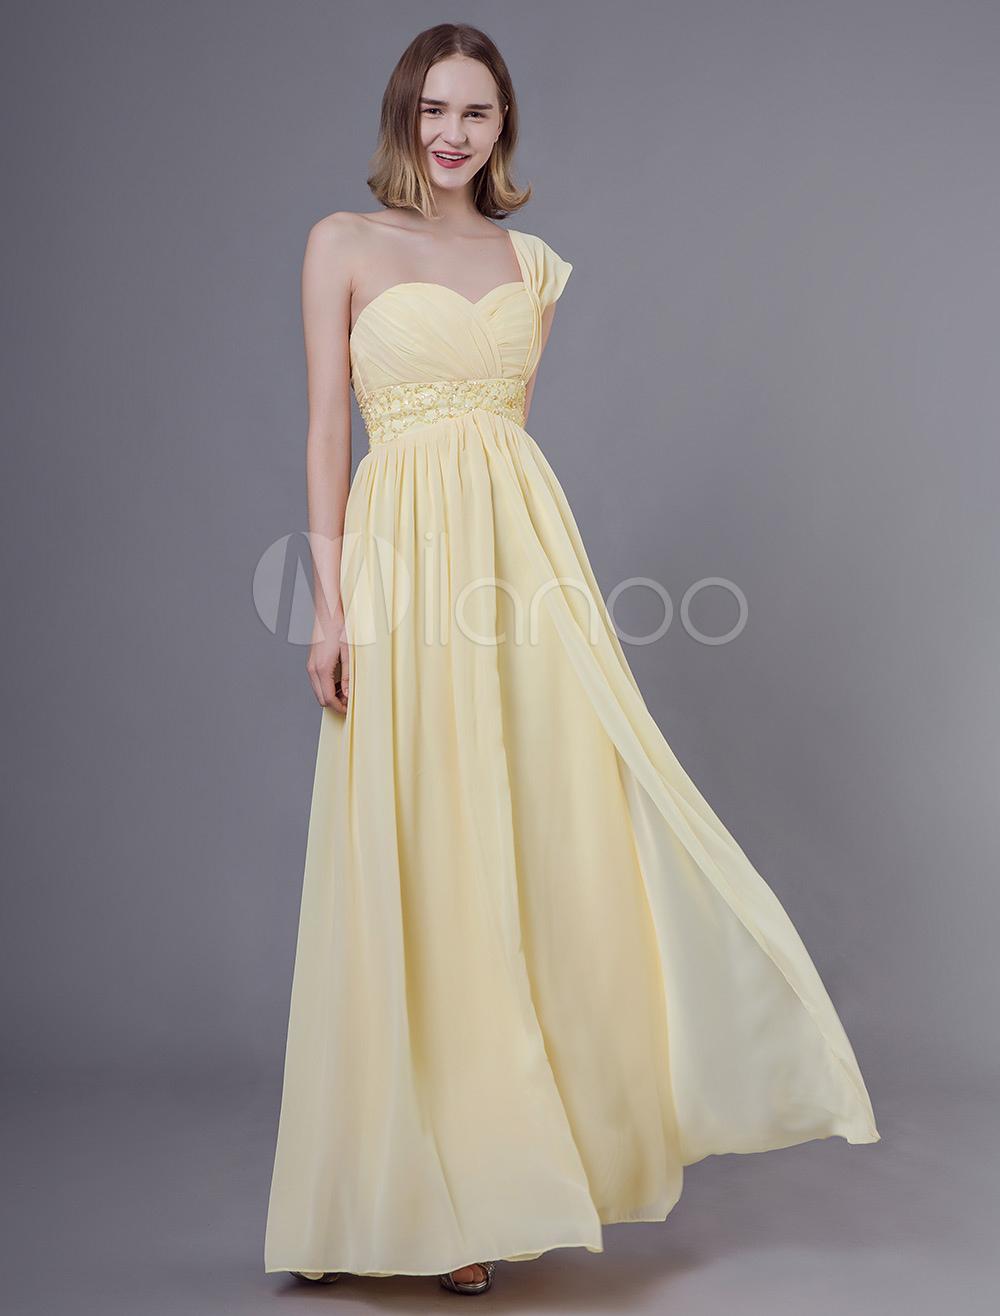 01d655e2da9 Bridesmaid Dresses One Shoulder Daffodil Chiffon Beaded Floor Length  Wedding Party Dress-No.1 ...